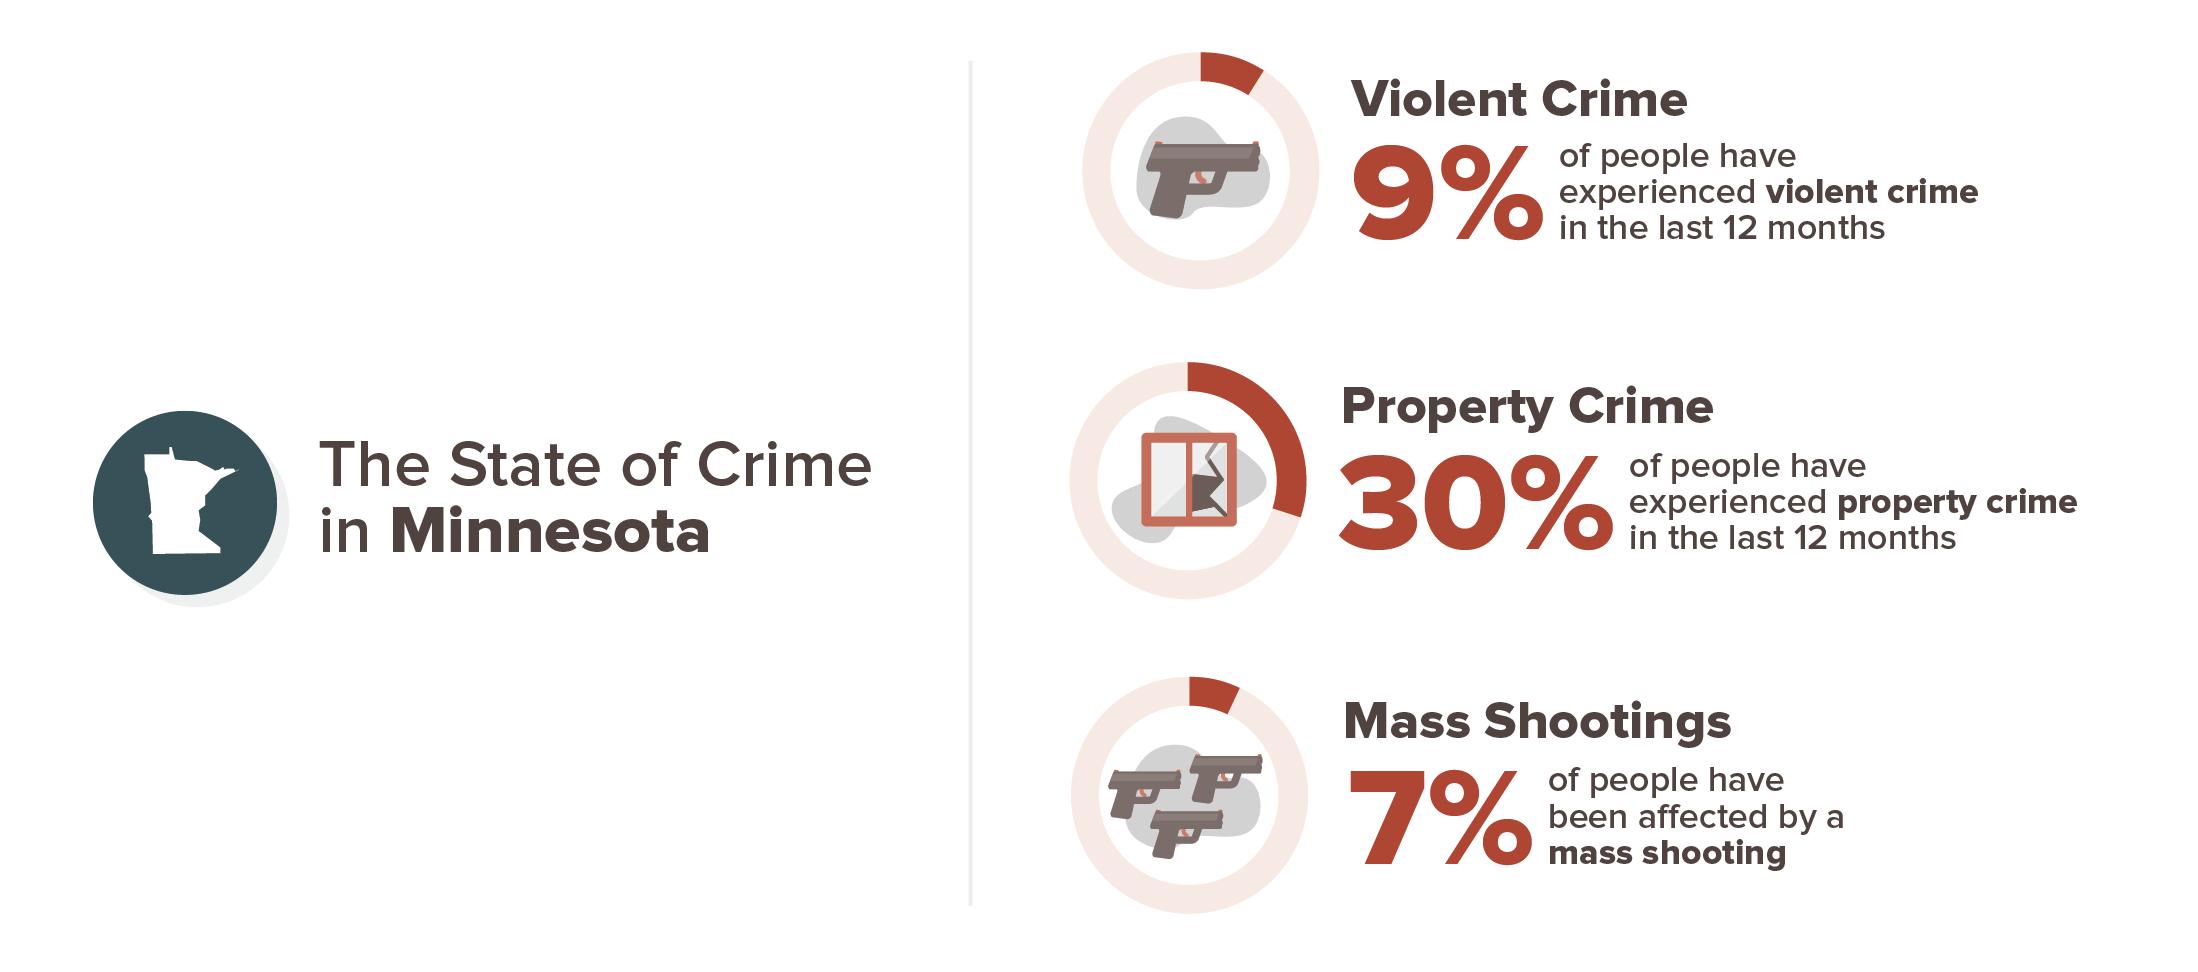 Minnesota crime experience infographic; 9% violent crime, 30% property crime, 7% mass shooting